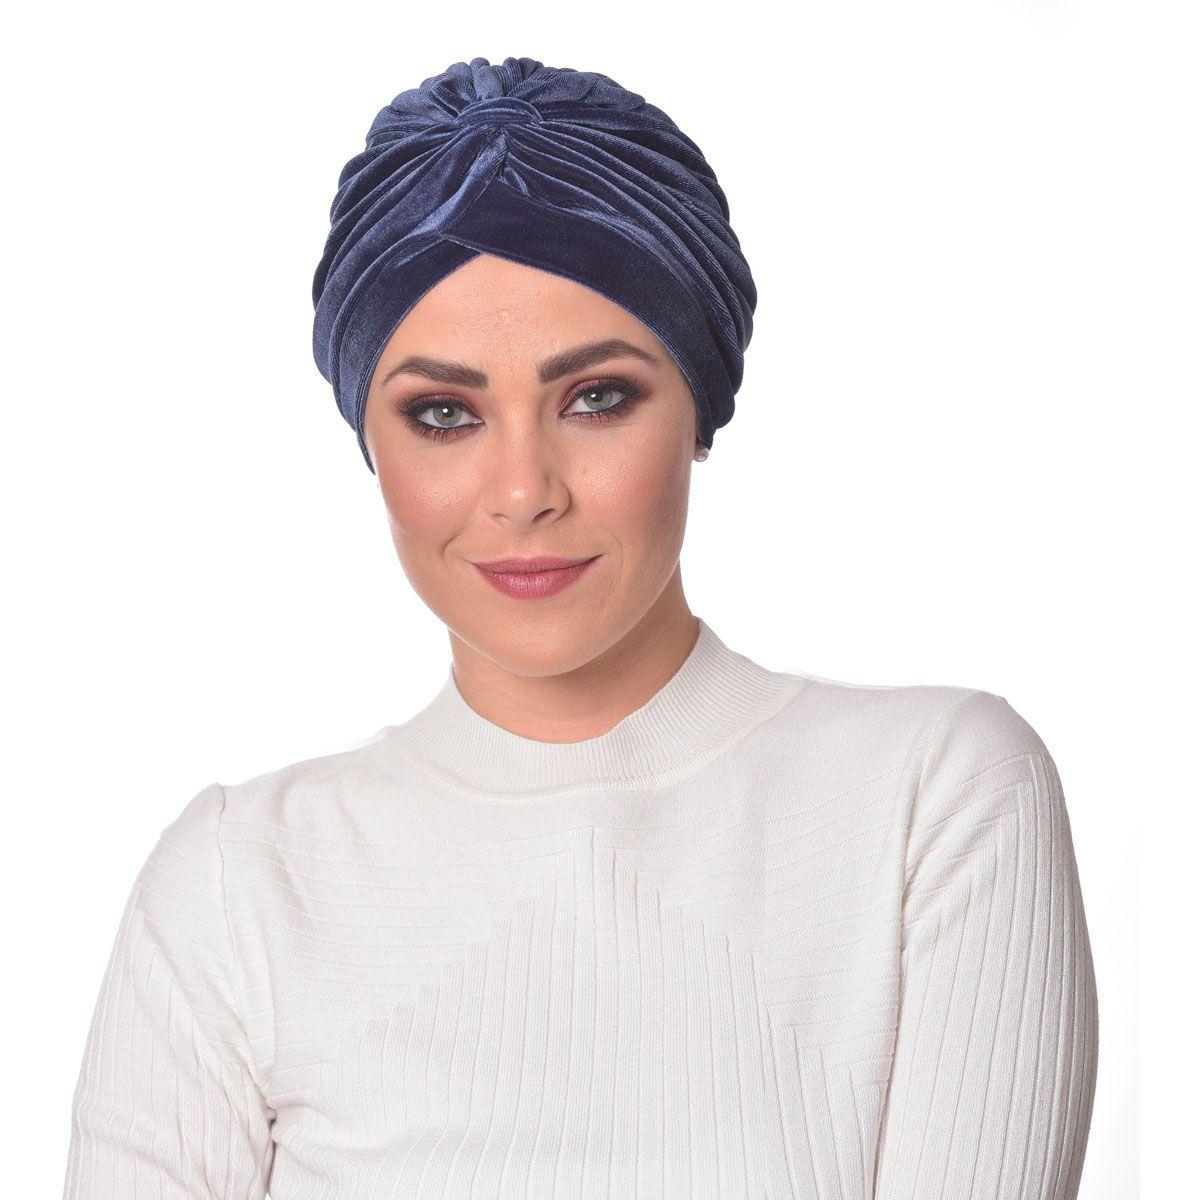 Turbante Fechado Drapeado Azul em Veludo